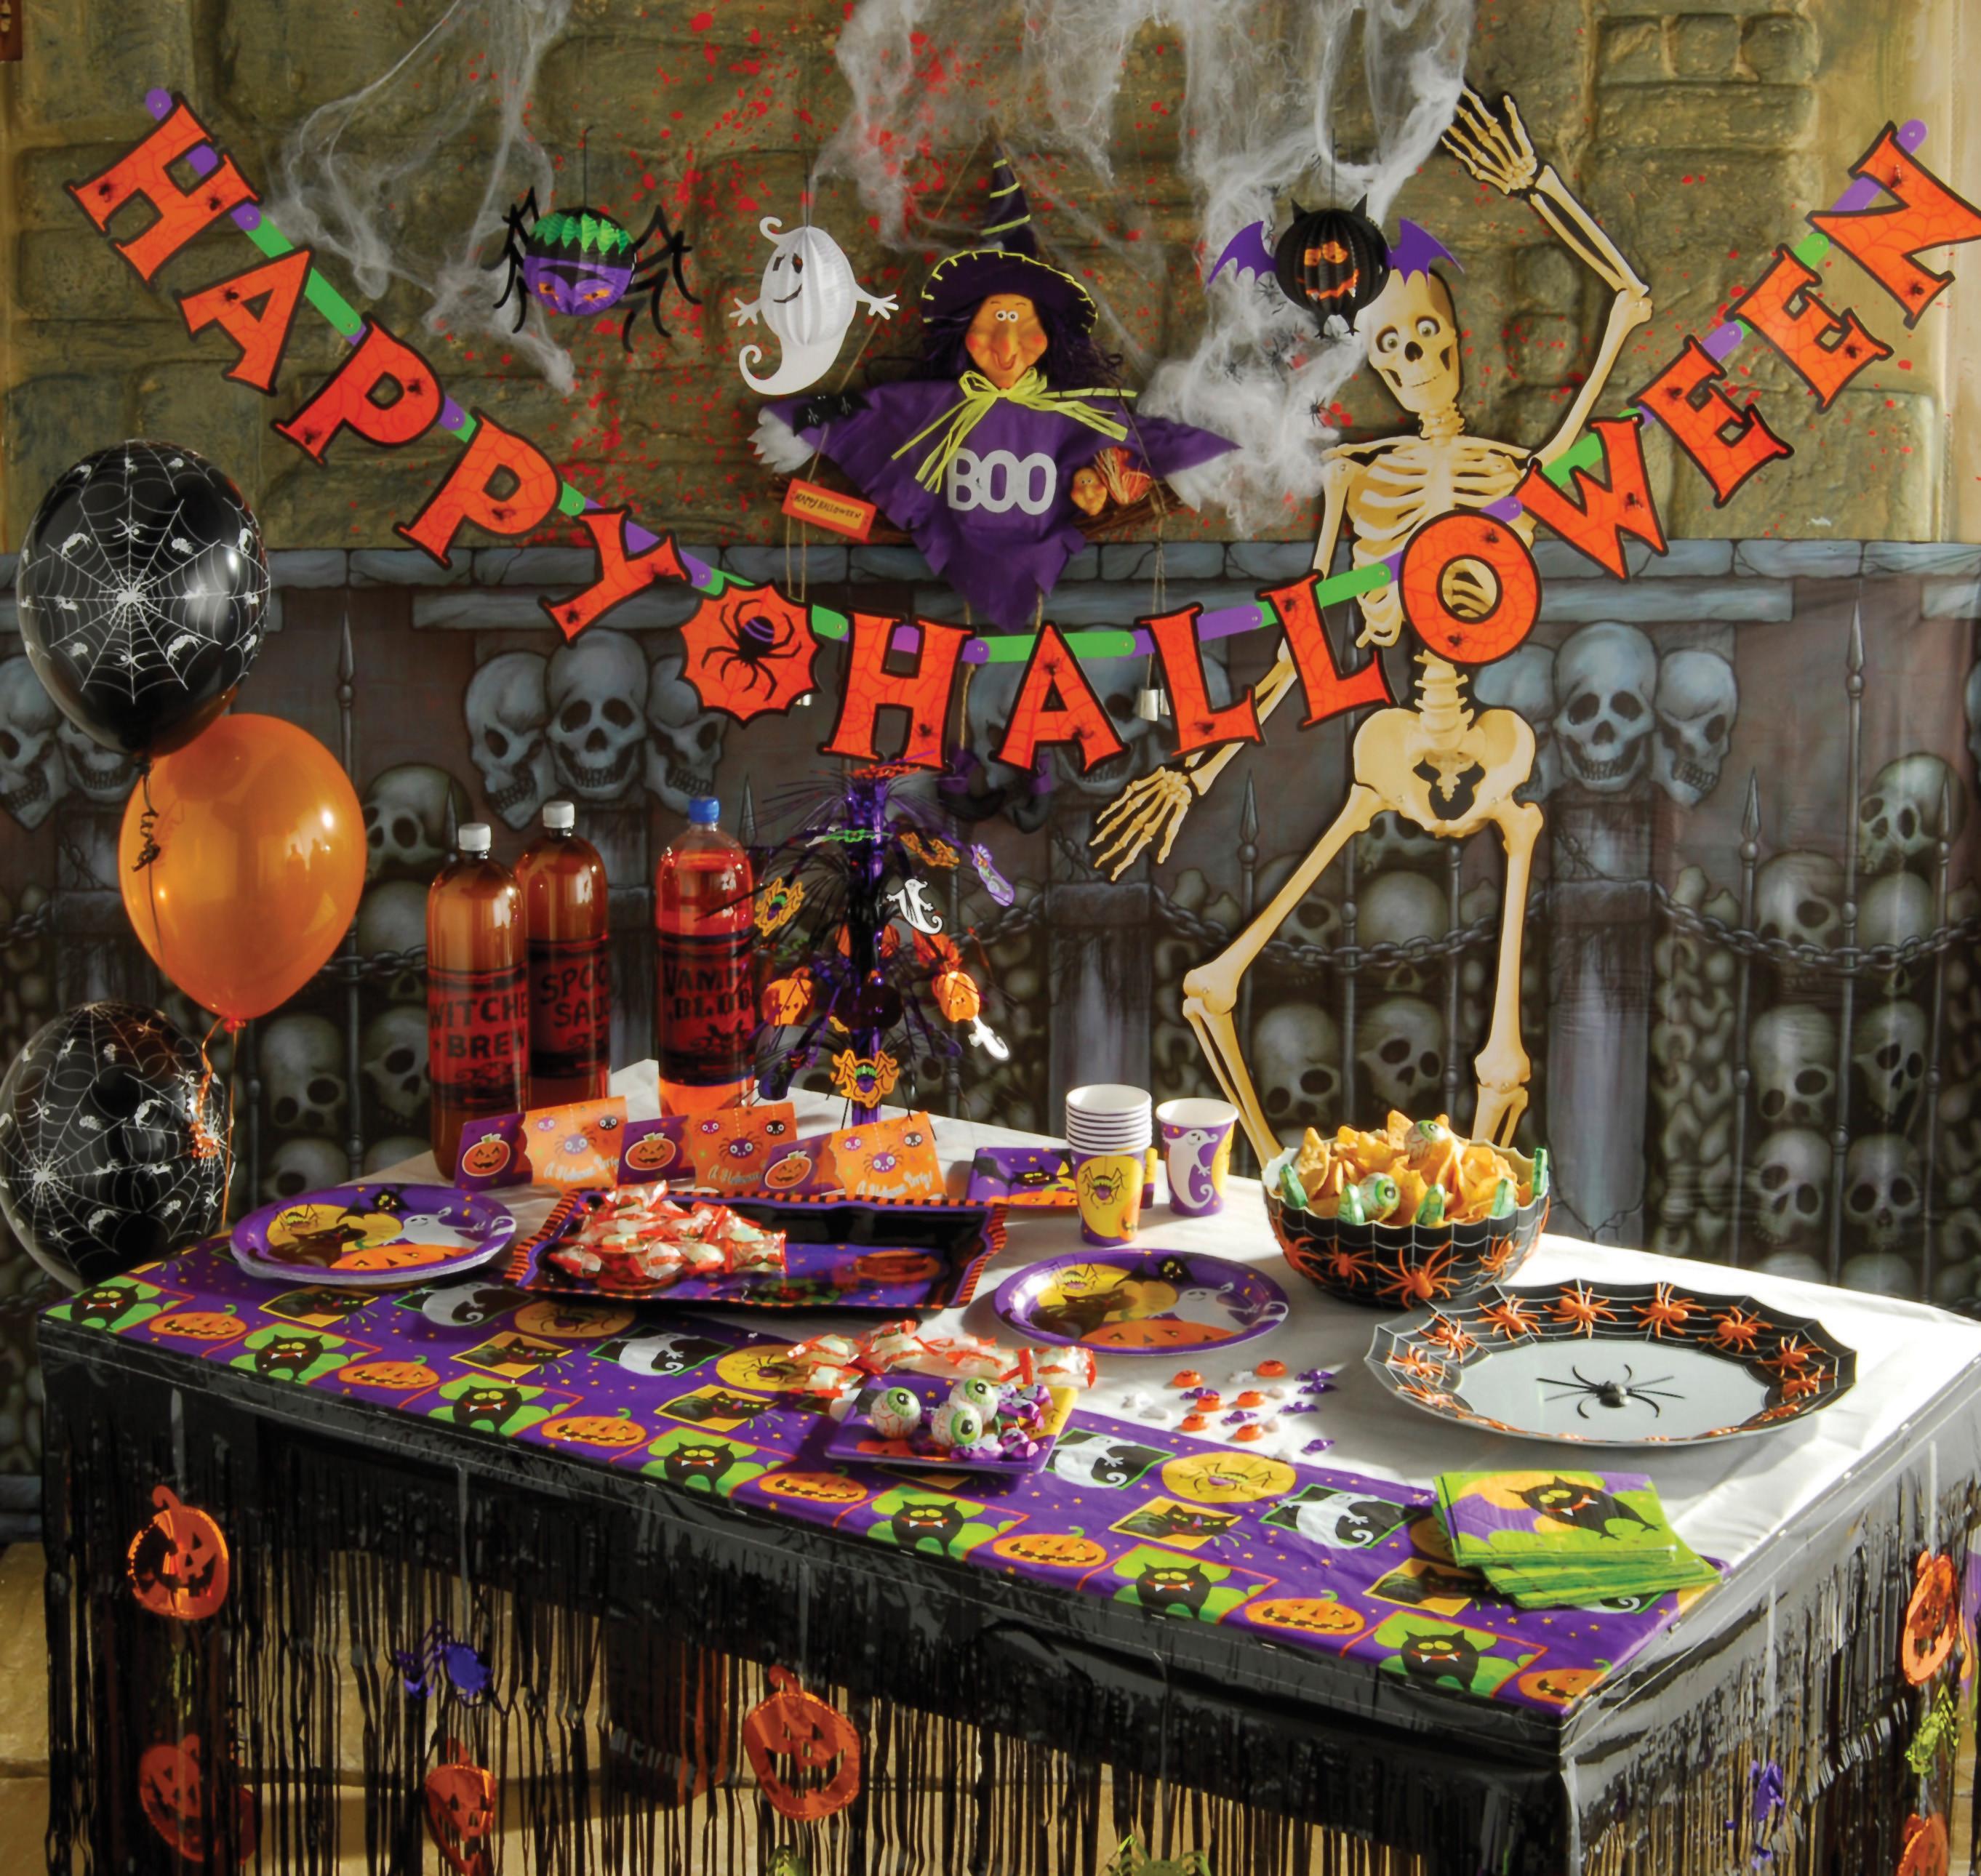 Halloween Decorating Party Ideas  SPOOKTACULAR HALLOWEEN TRICKS & TREATS FROM MATALAN